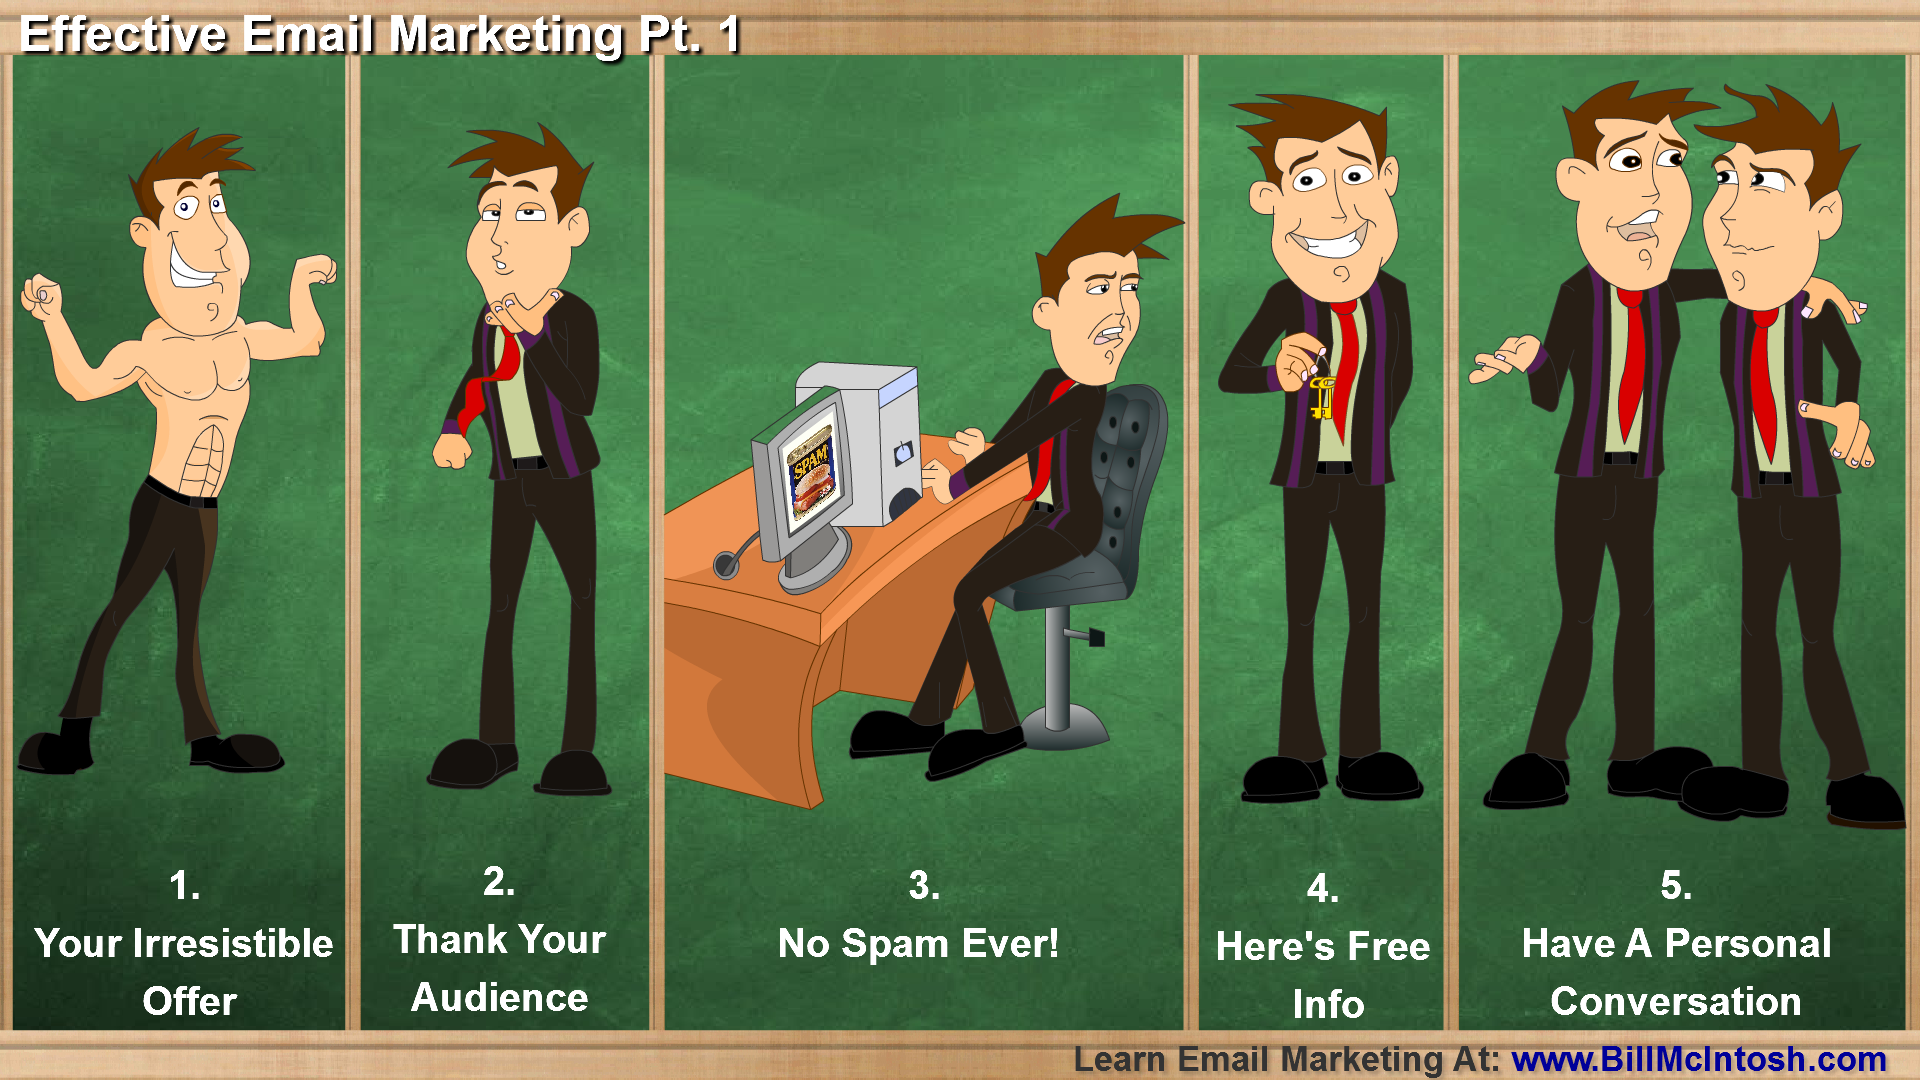 Effective E-mail Marketing Image Part 1